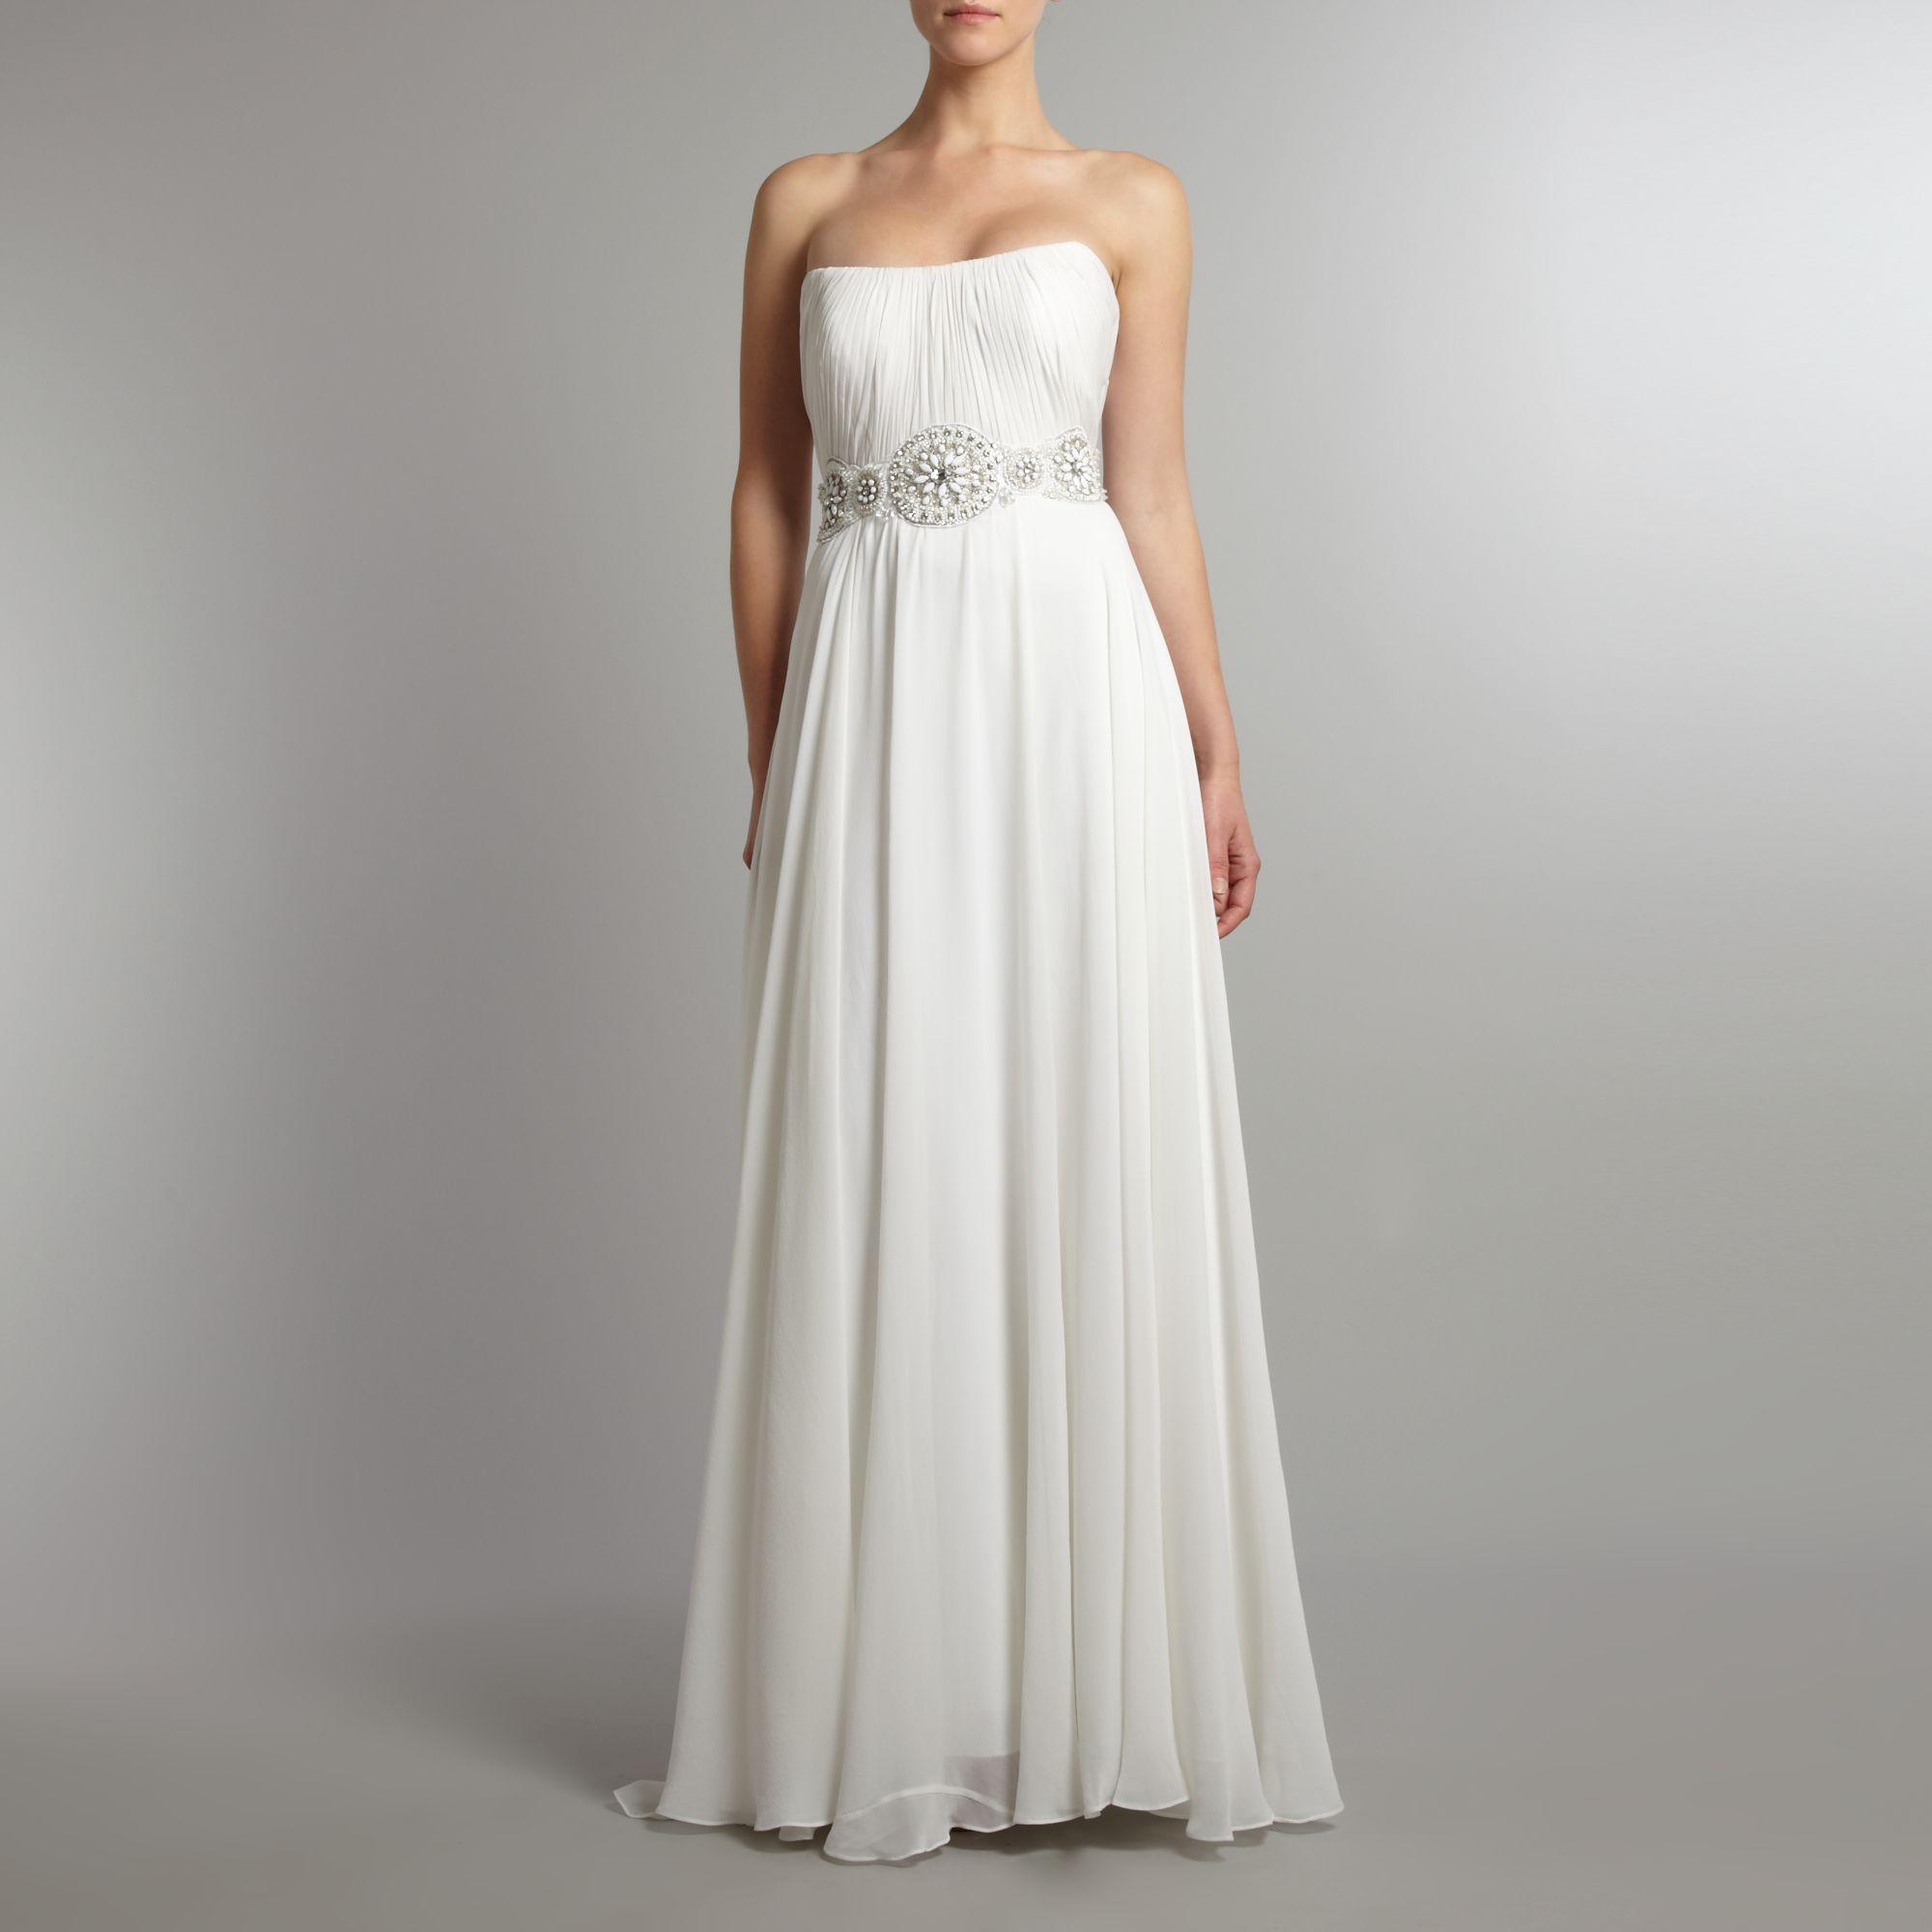 Theia Silk Chiffon Goddess Bridal Dress In White